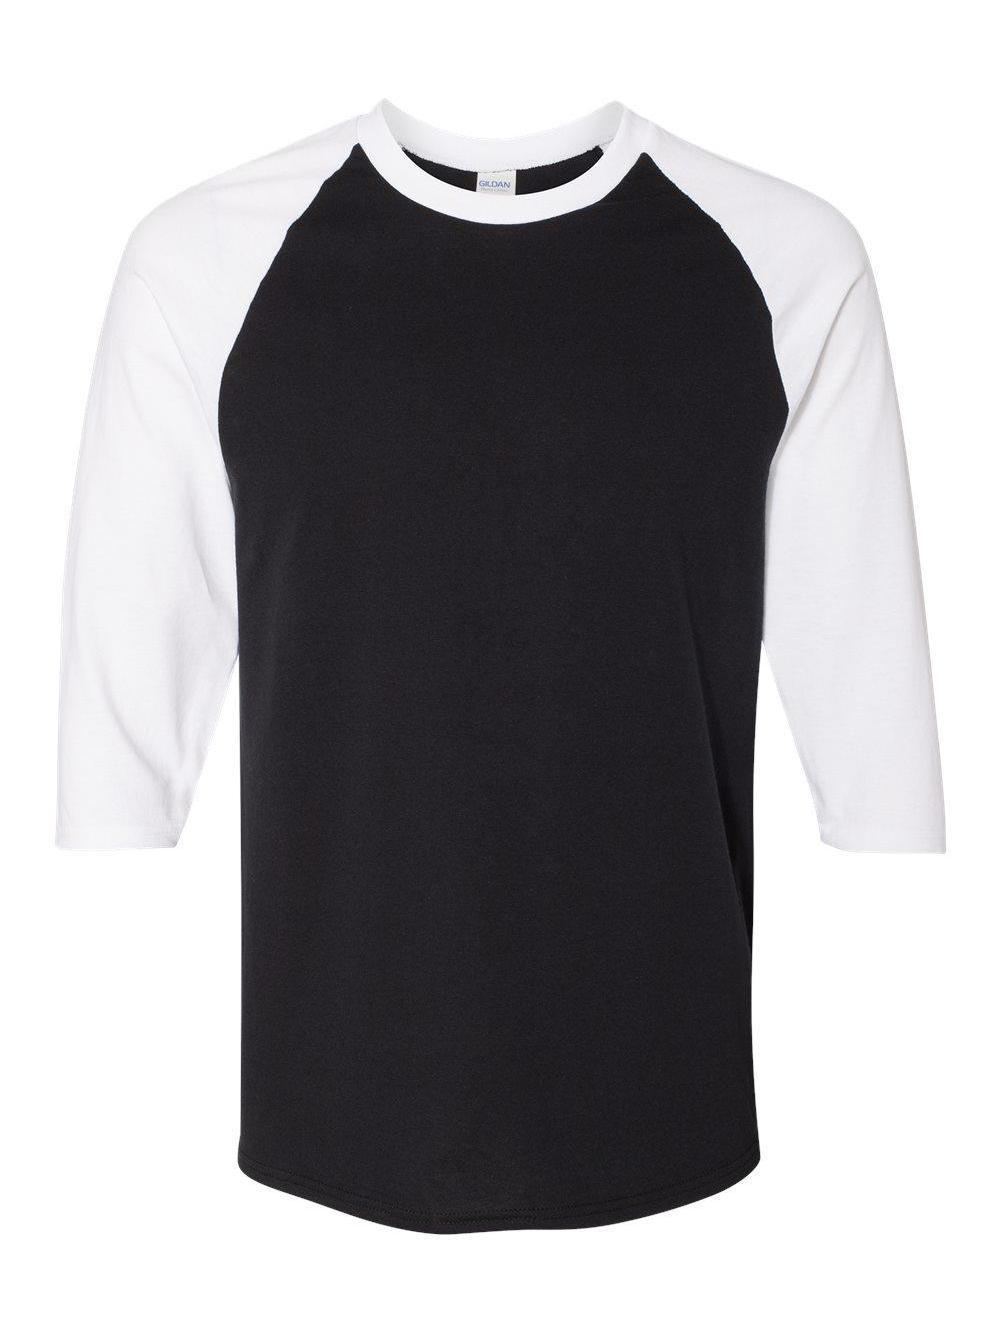 Gildan-Heavy-Cotton-Three-Quarter-Raglan-Sleeve-Baseball-T-Shirt-5700 thumbnail 3